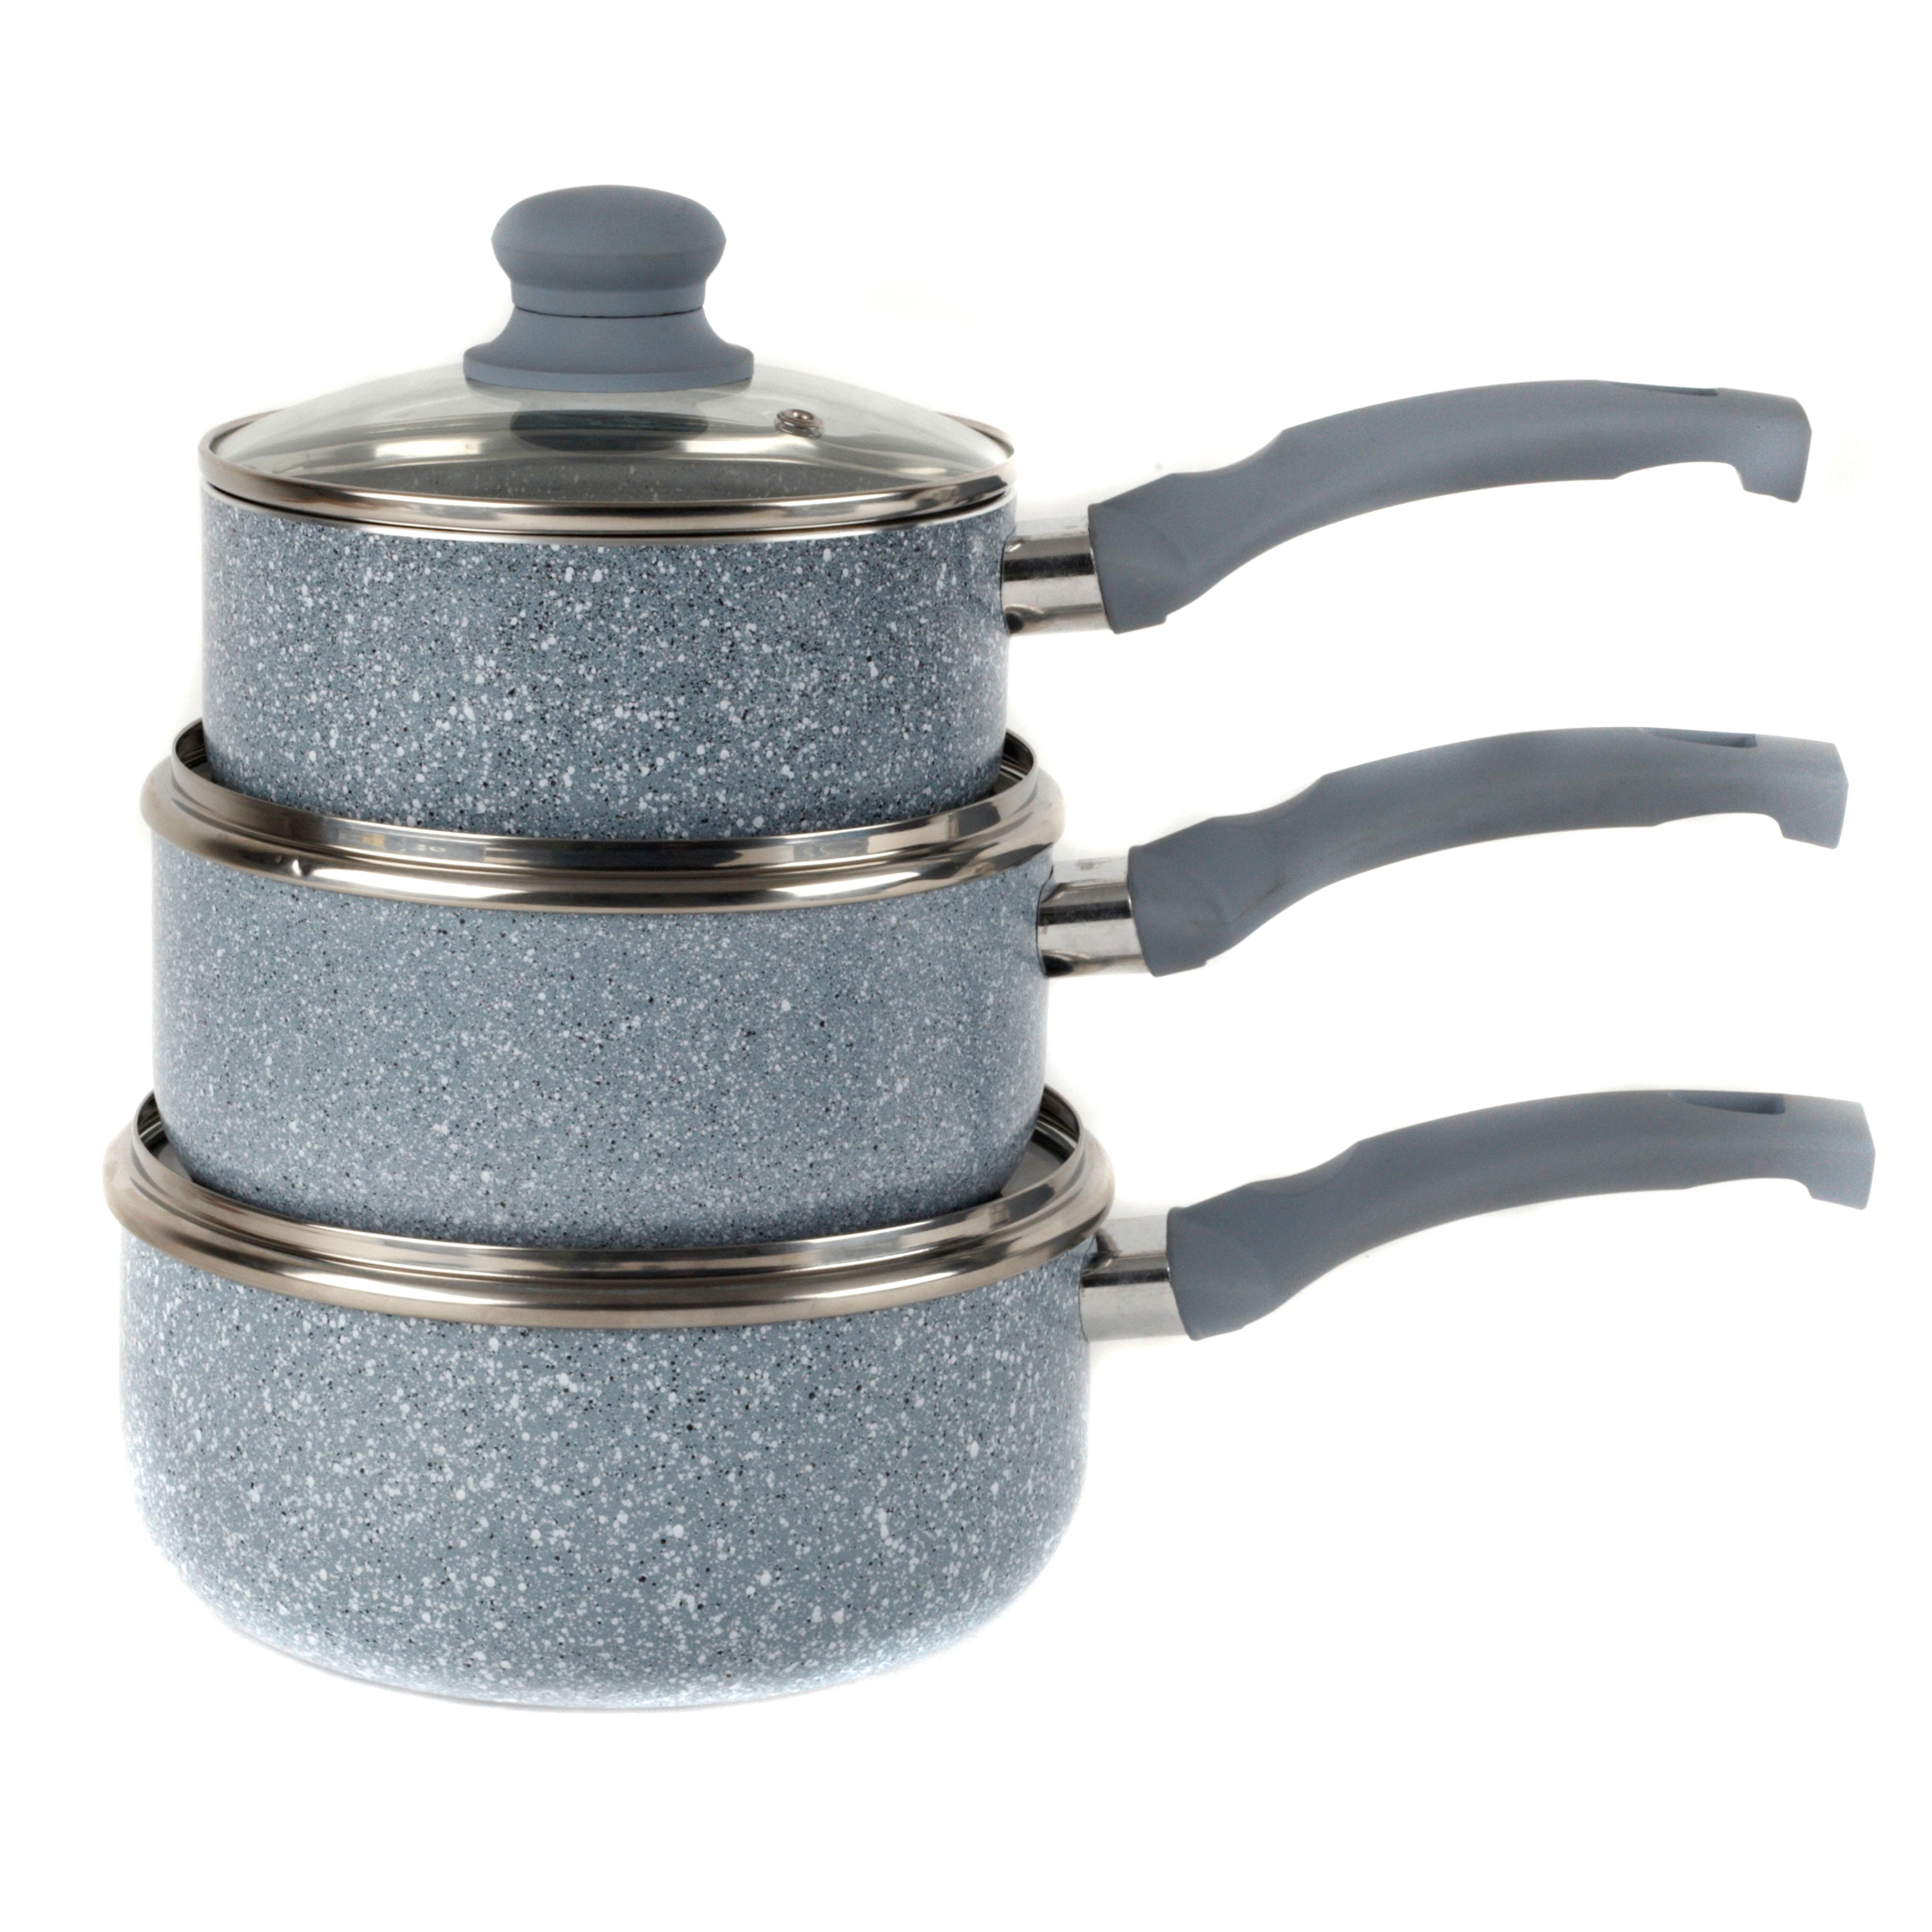 stoneware pots and pans reviews